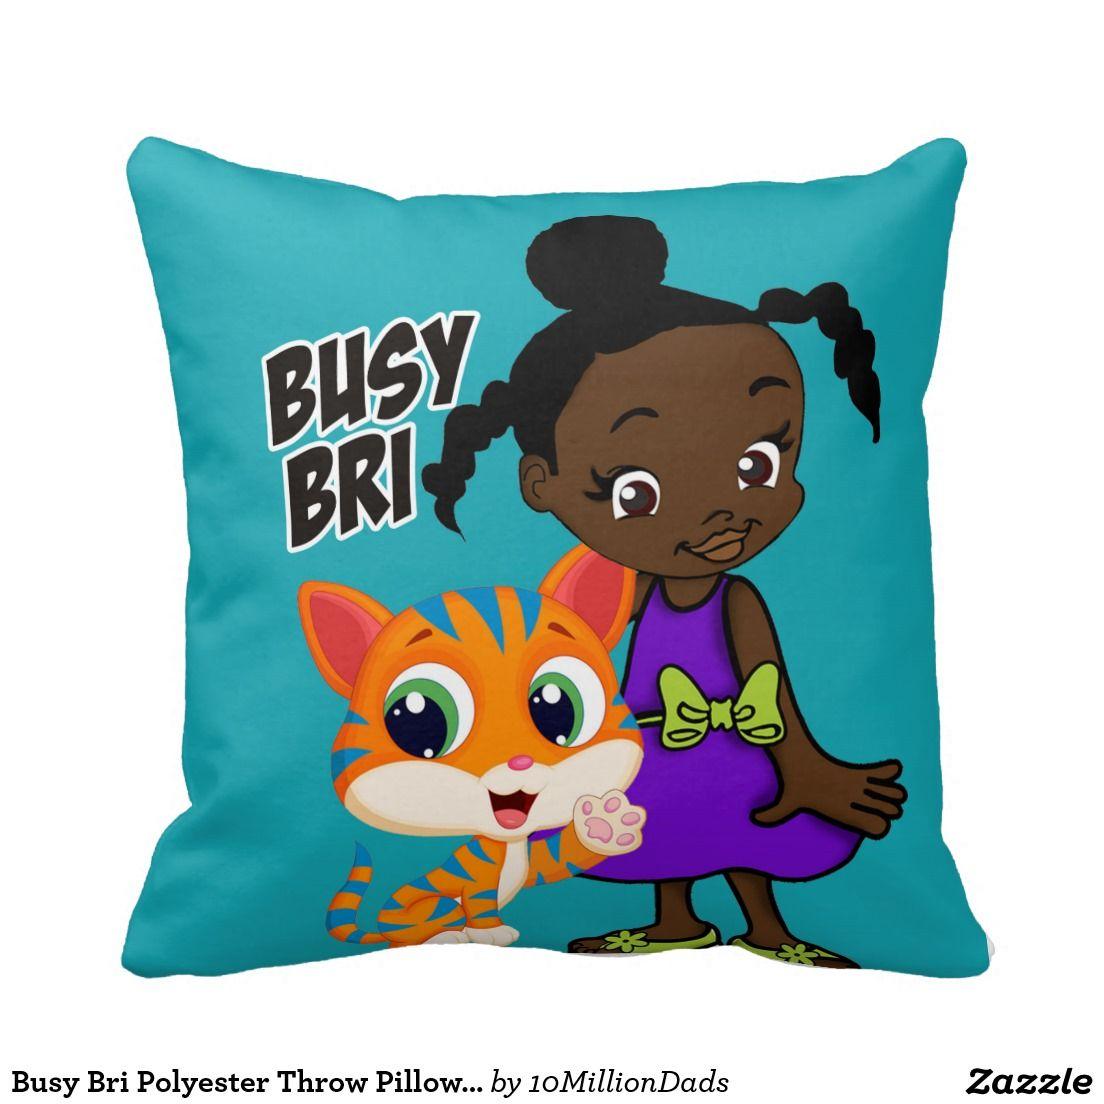 Busy bri polyester throw pillow 16 x 16 nursery decor